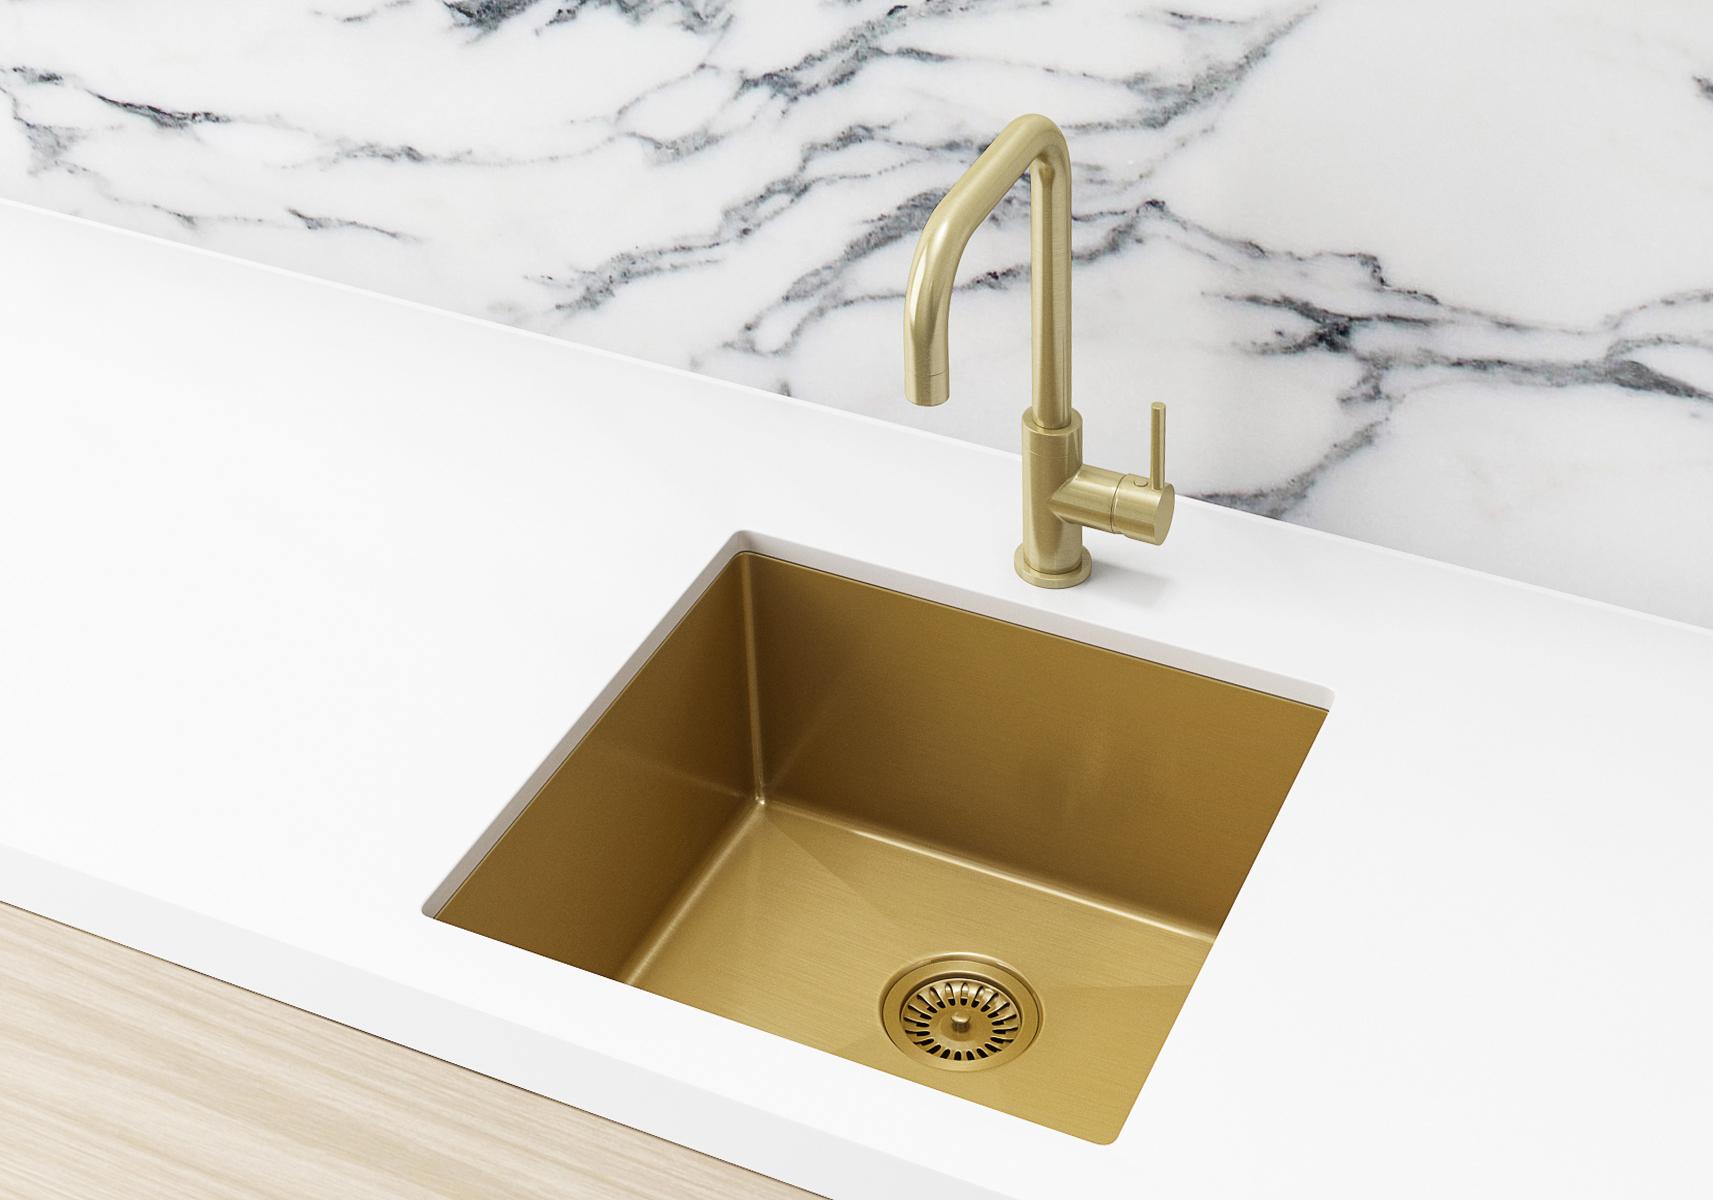 lavello-kitchen-sink-single-bowl-450-x-450-brushed-bronze-gold